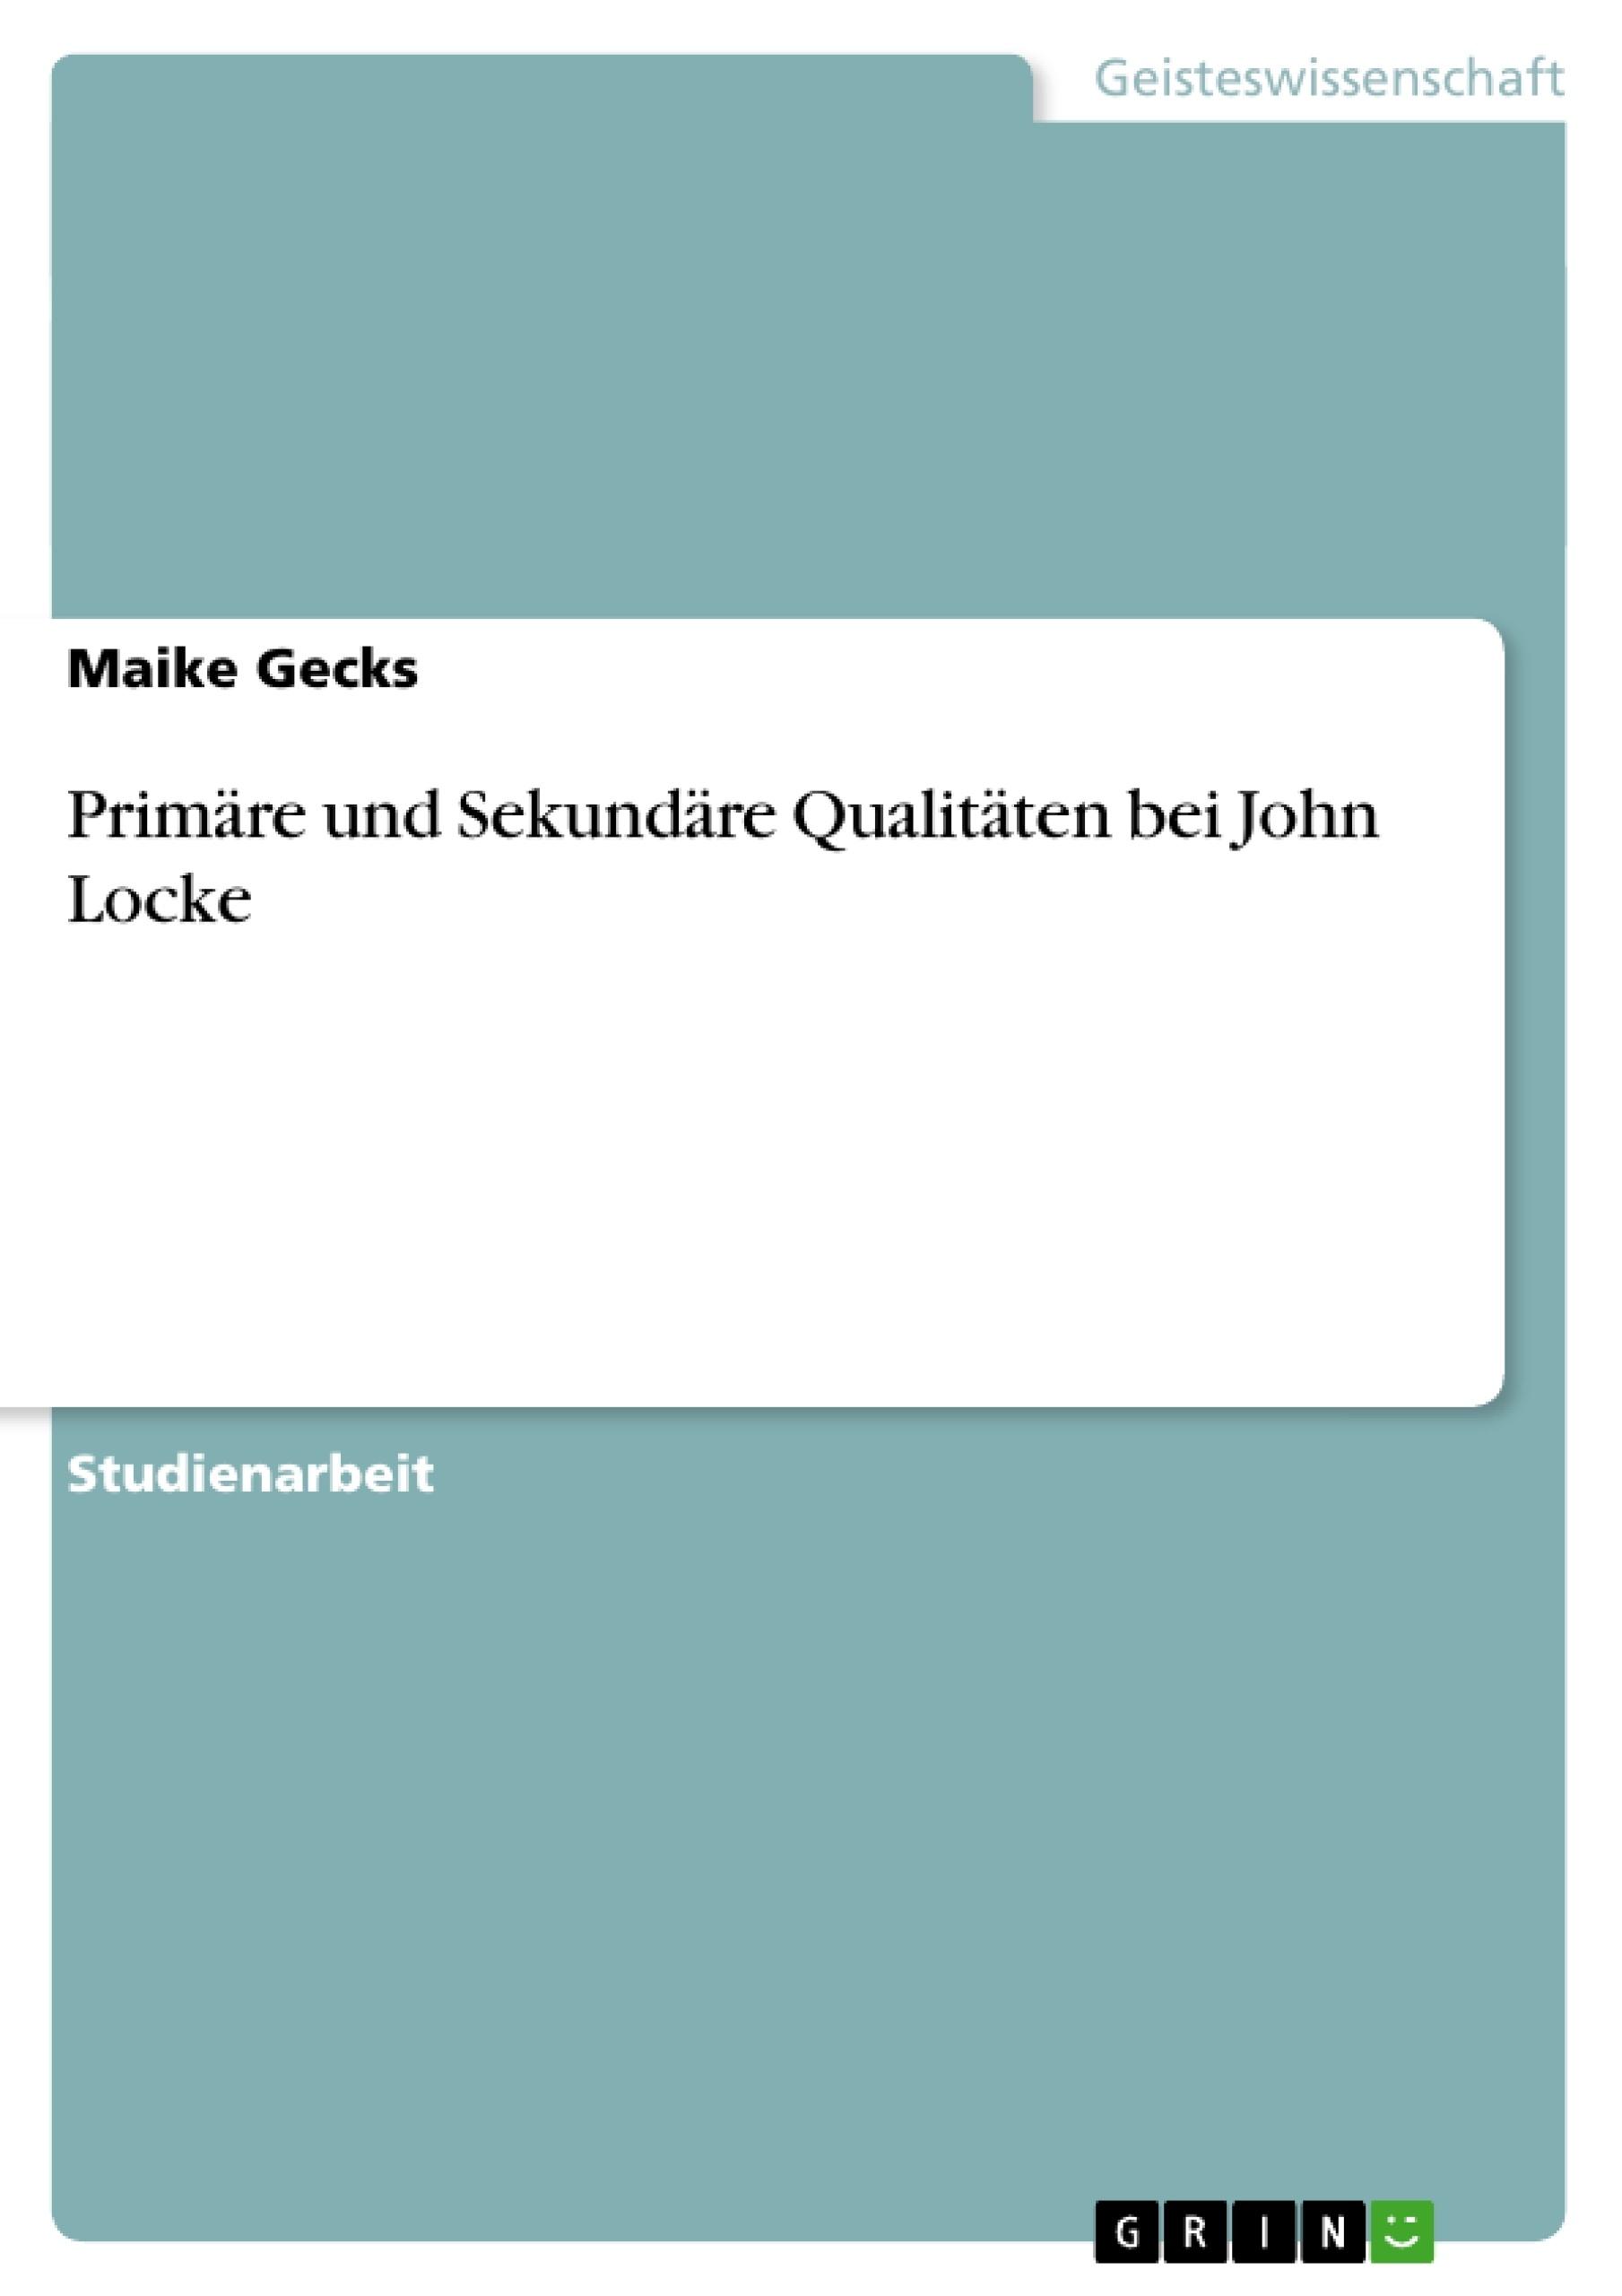 Titel: Primäre und Sekundäre Qualitäten bei John Locke